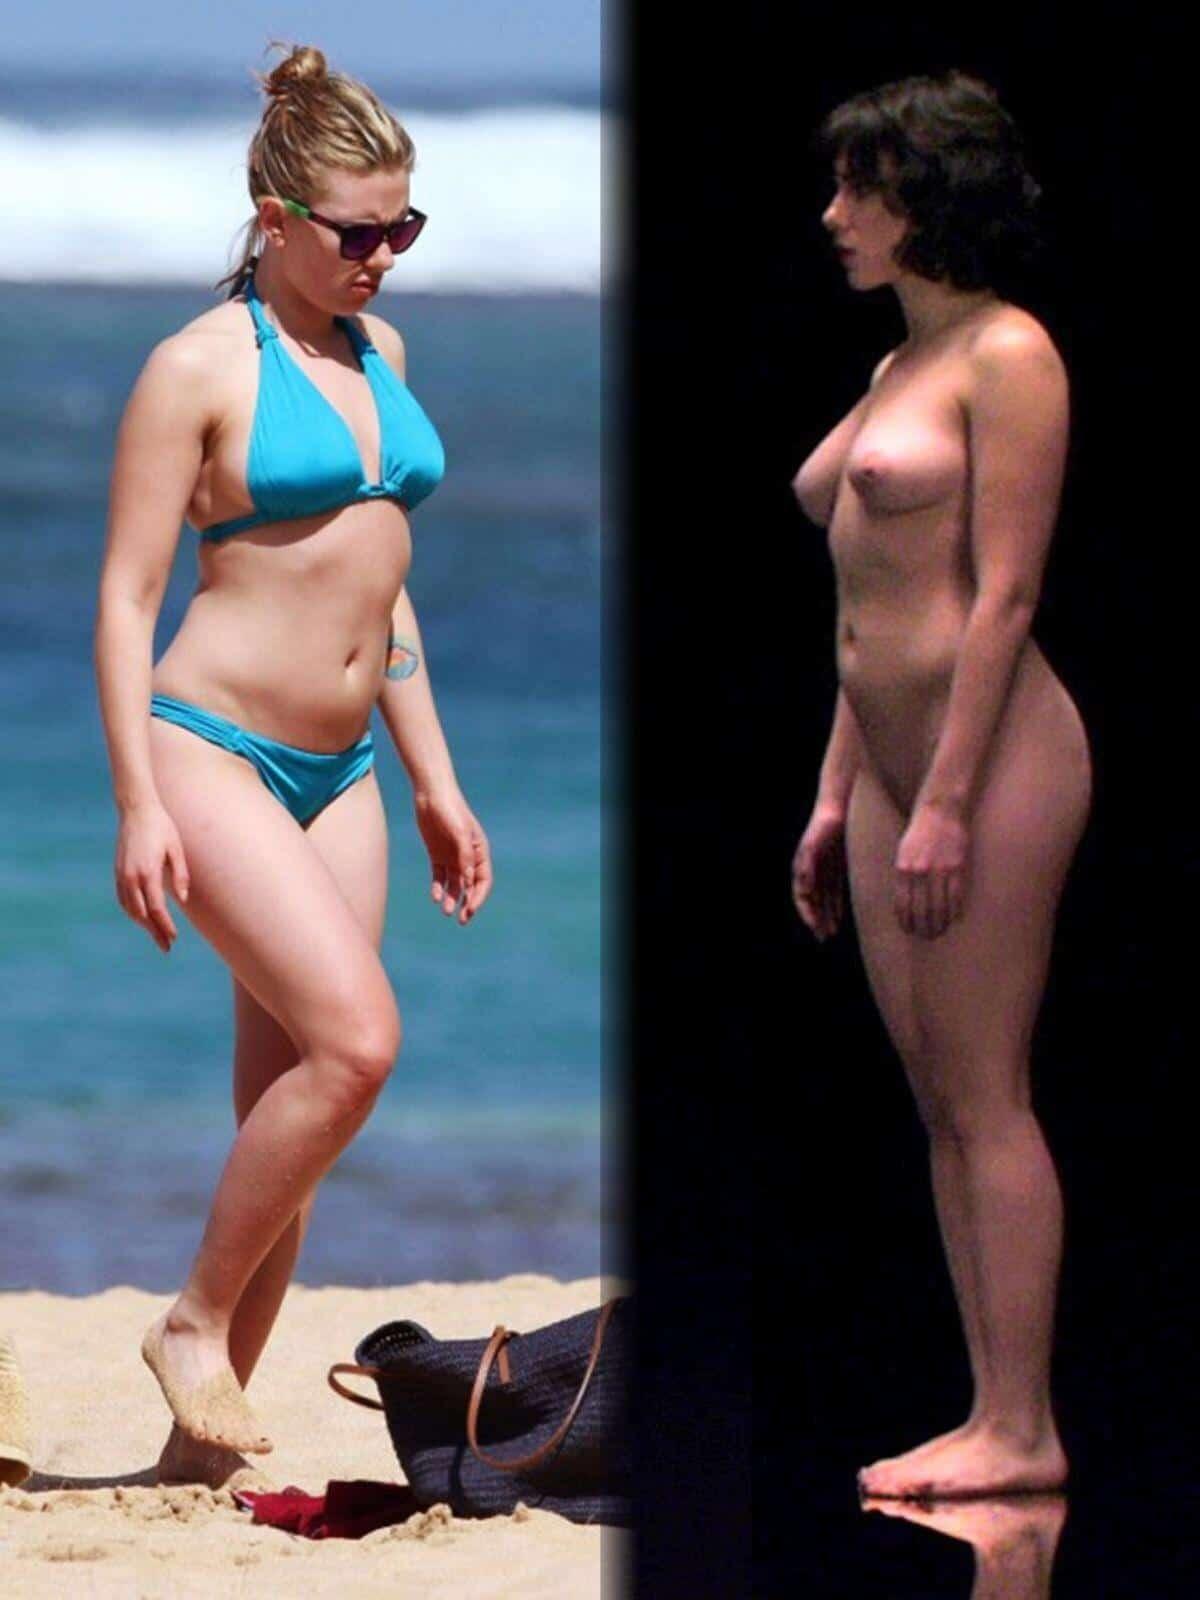 Scarlett johansson nude beach